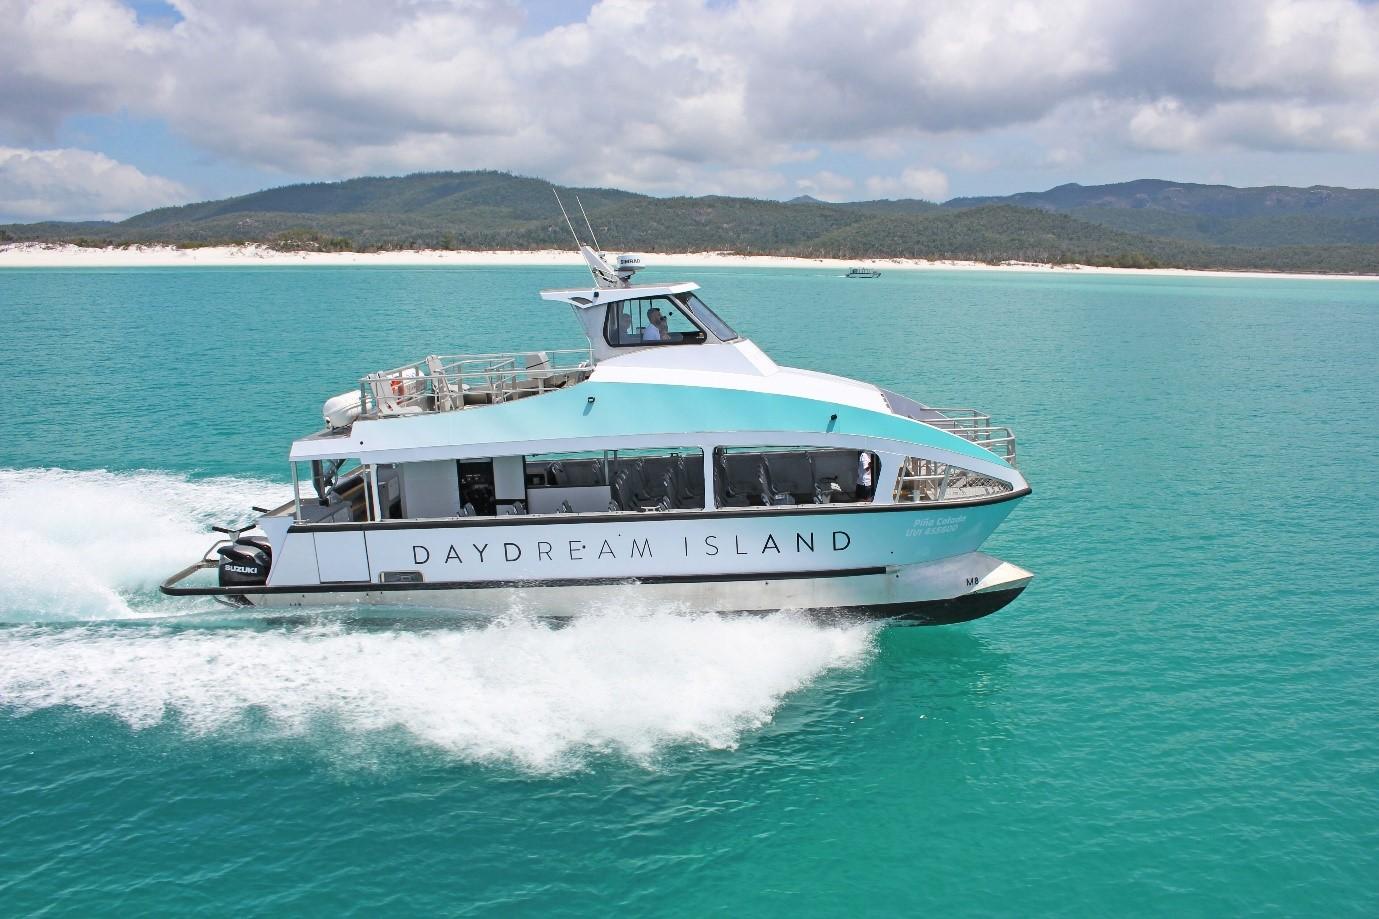 Boat to Daydream Island